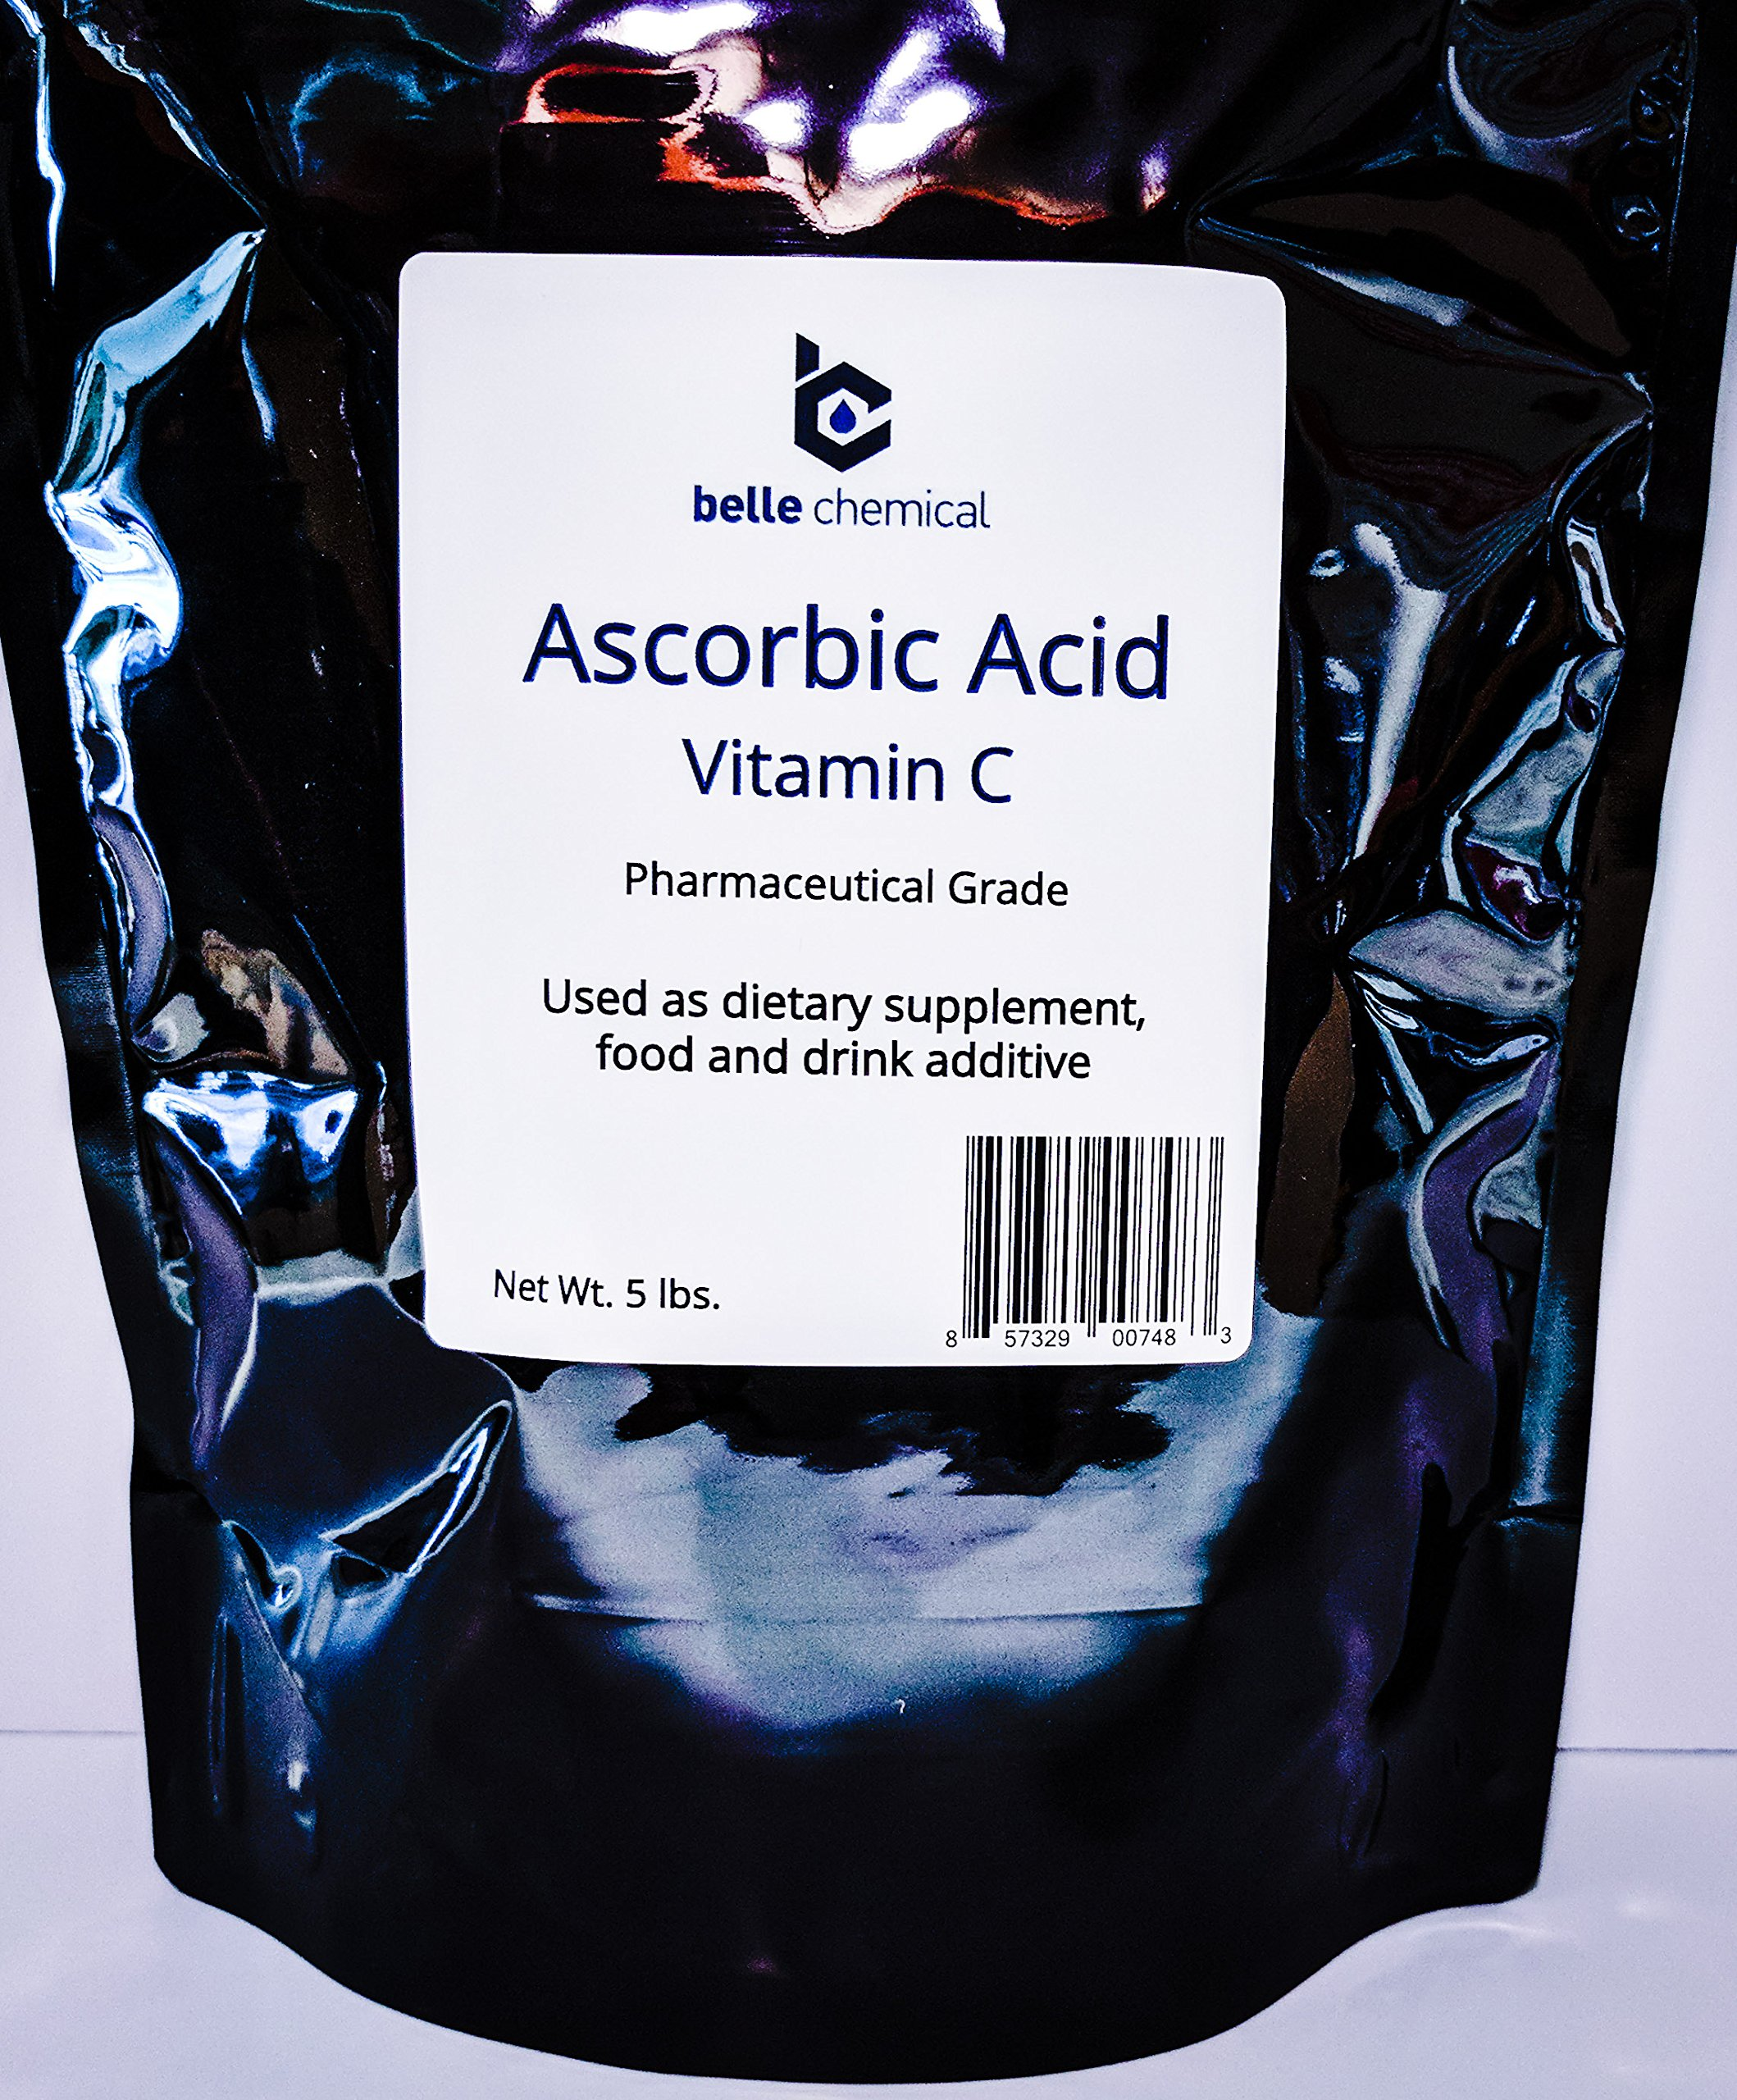 Pure Ascorbic Acid (Vitamin C) Pharmaceutical Grade, Non-GMO, Soy/Peanut Free (5 Pound (2,270g))